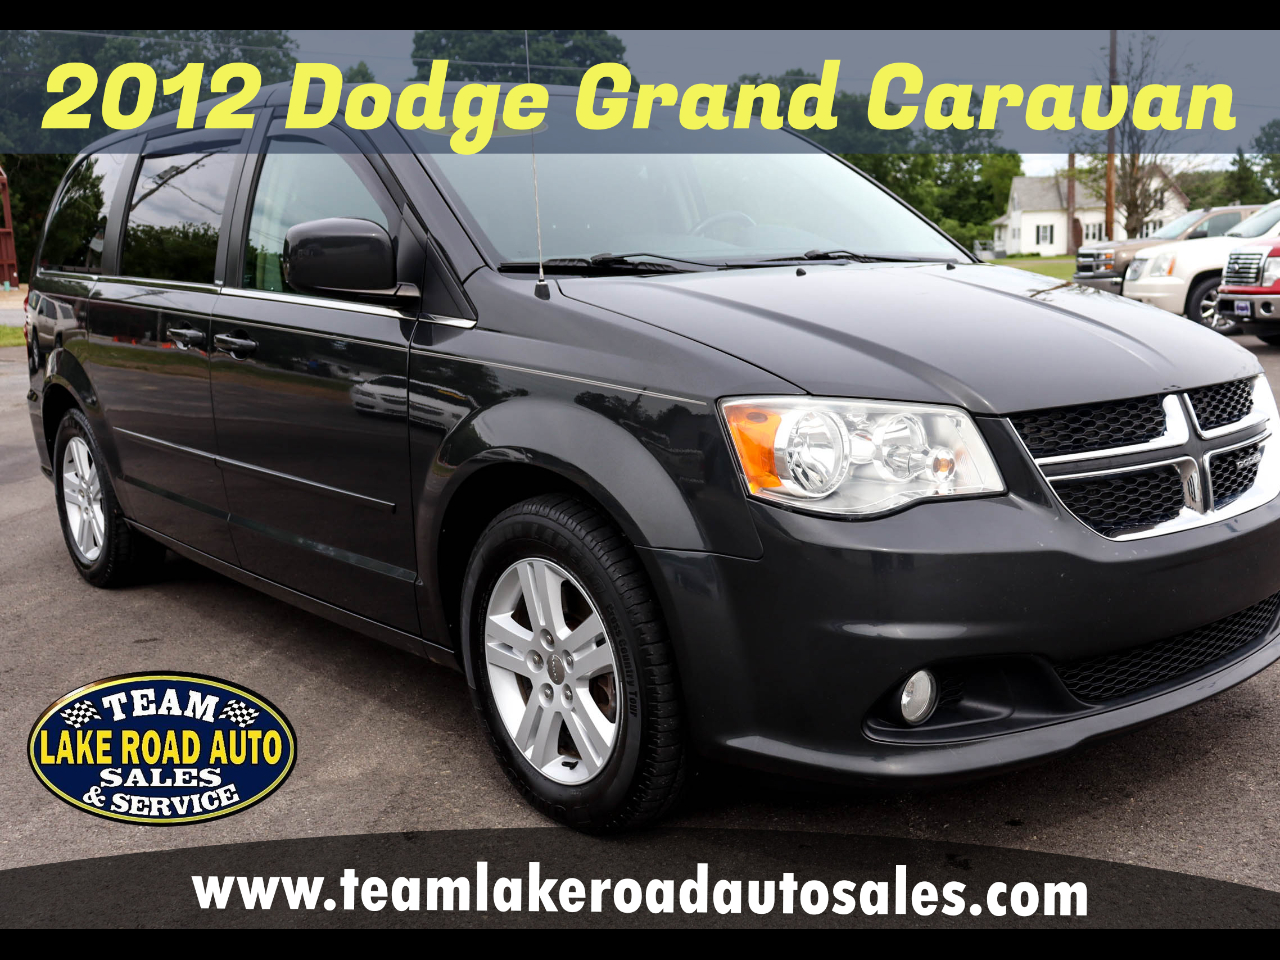 Dodge Grand Caravan 4dr Wgn Crew 2012